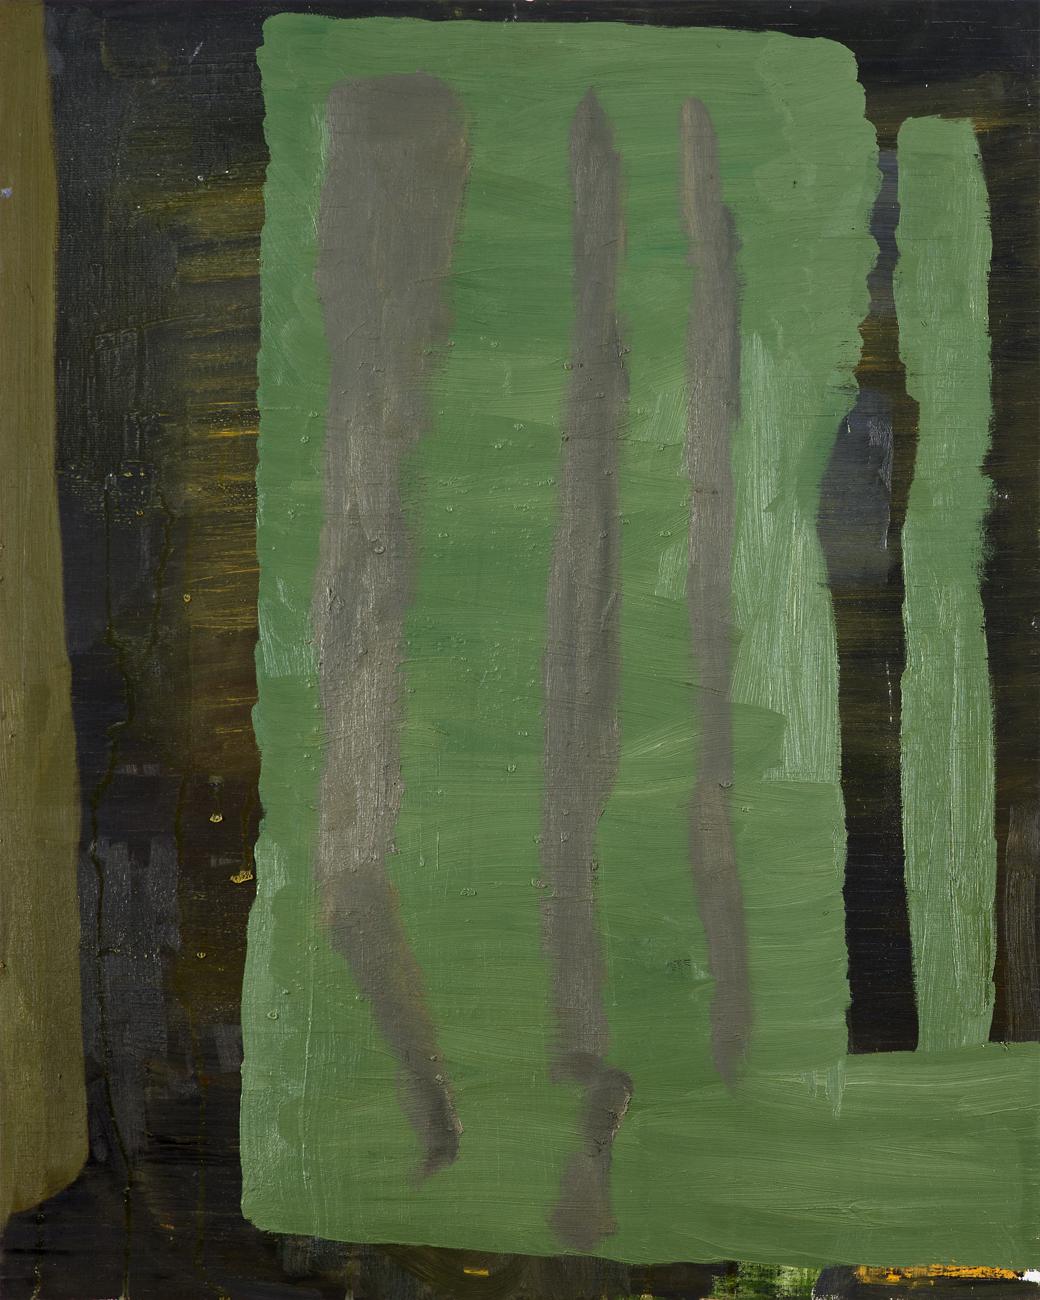 Andreas Eriksson  Draperi  2010 Oil on panel 75 x 60 cm